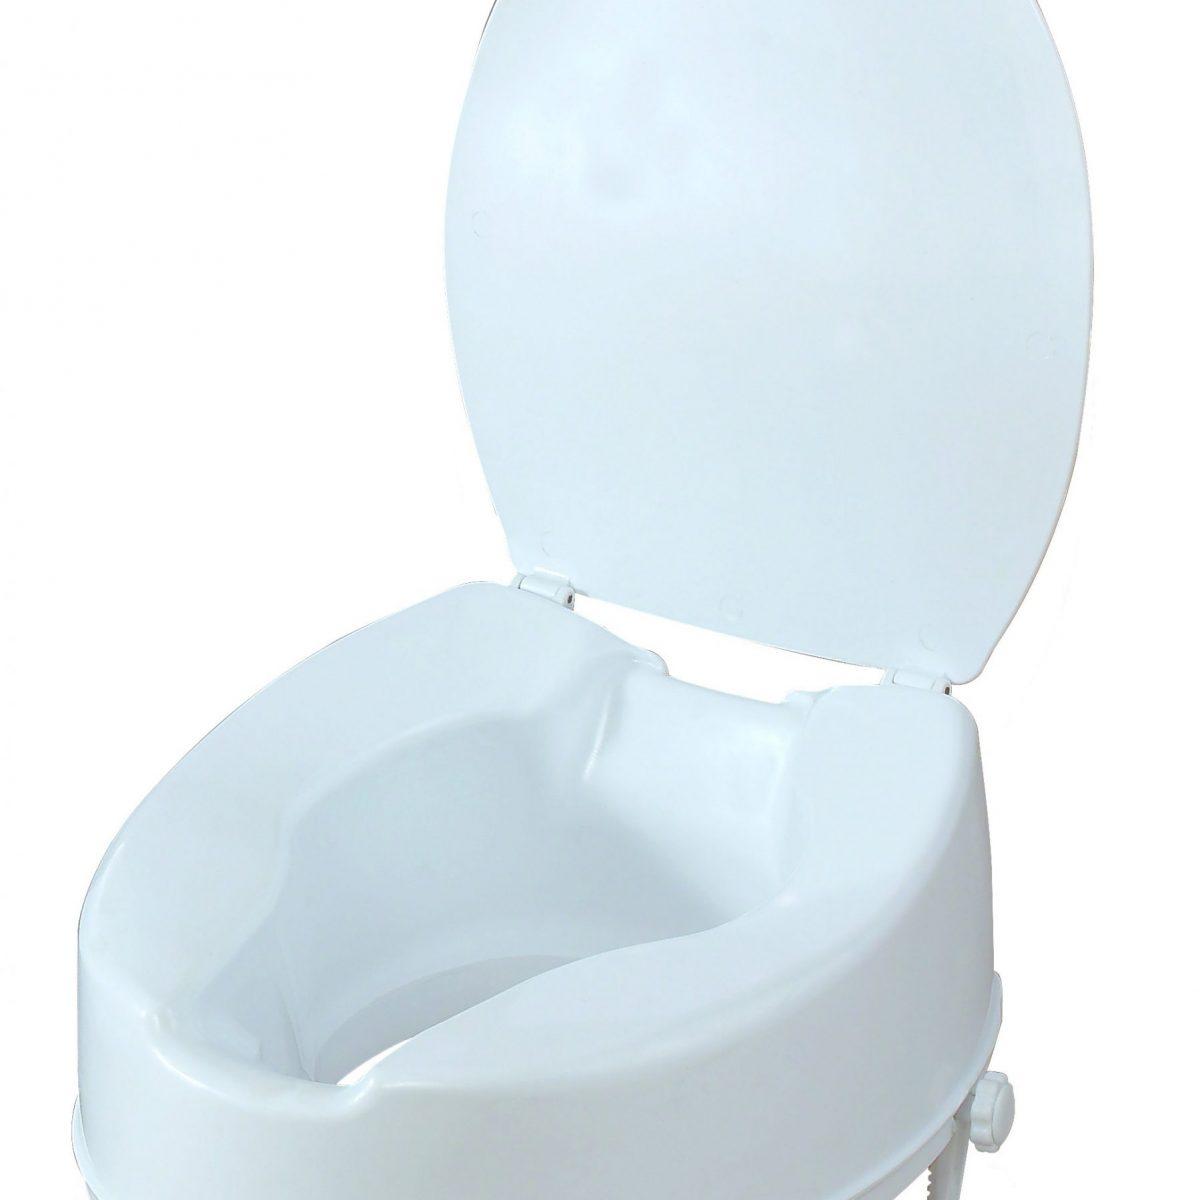 Inaltator WC Easy Clip 15cm cu capac